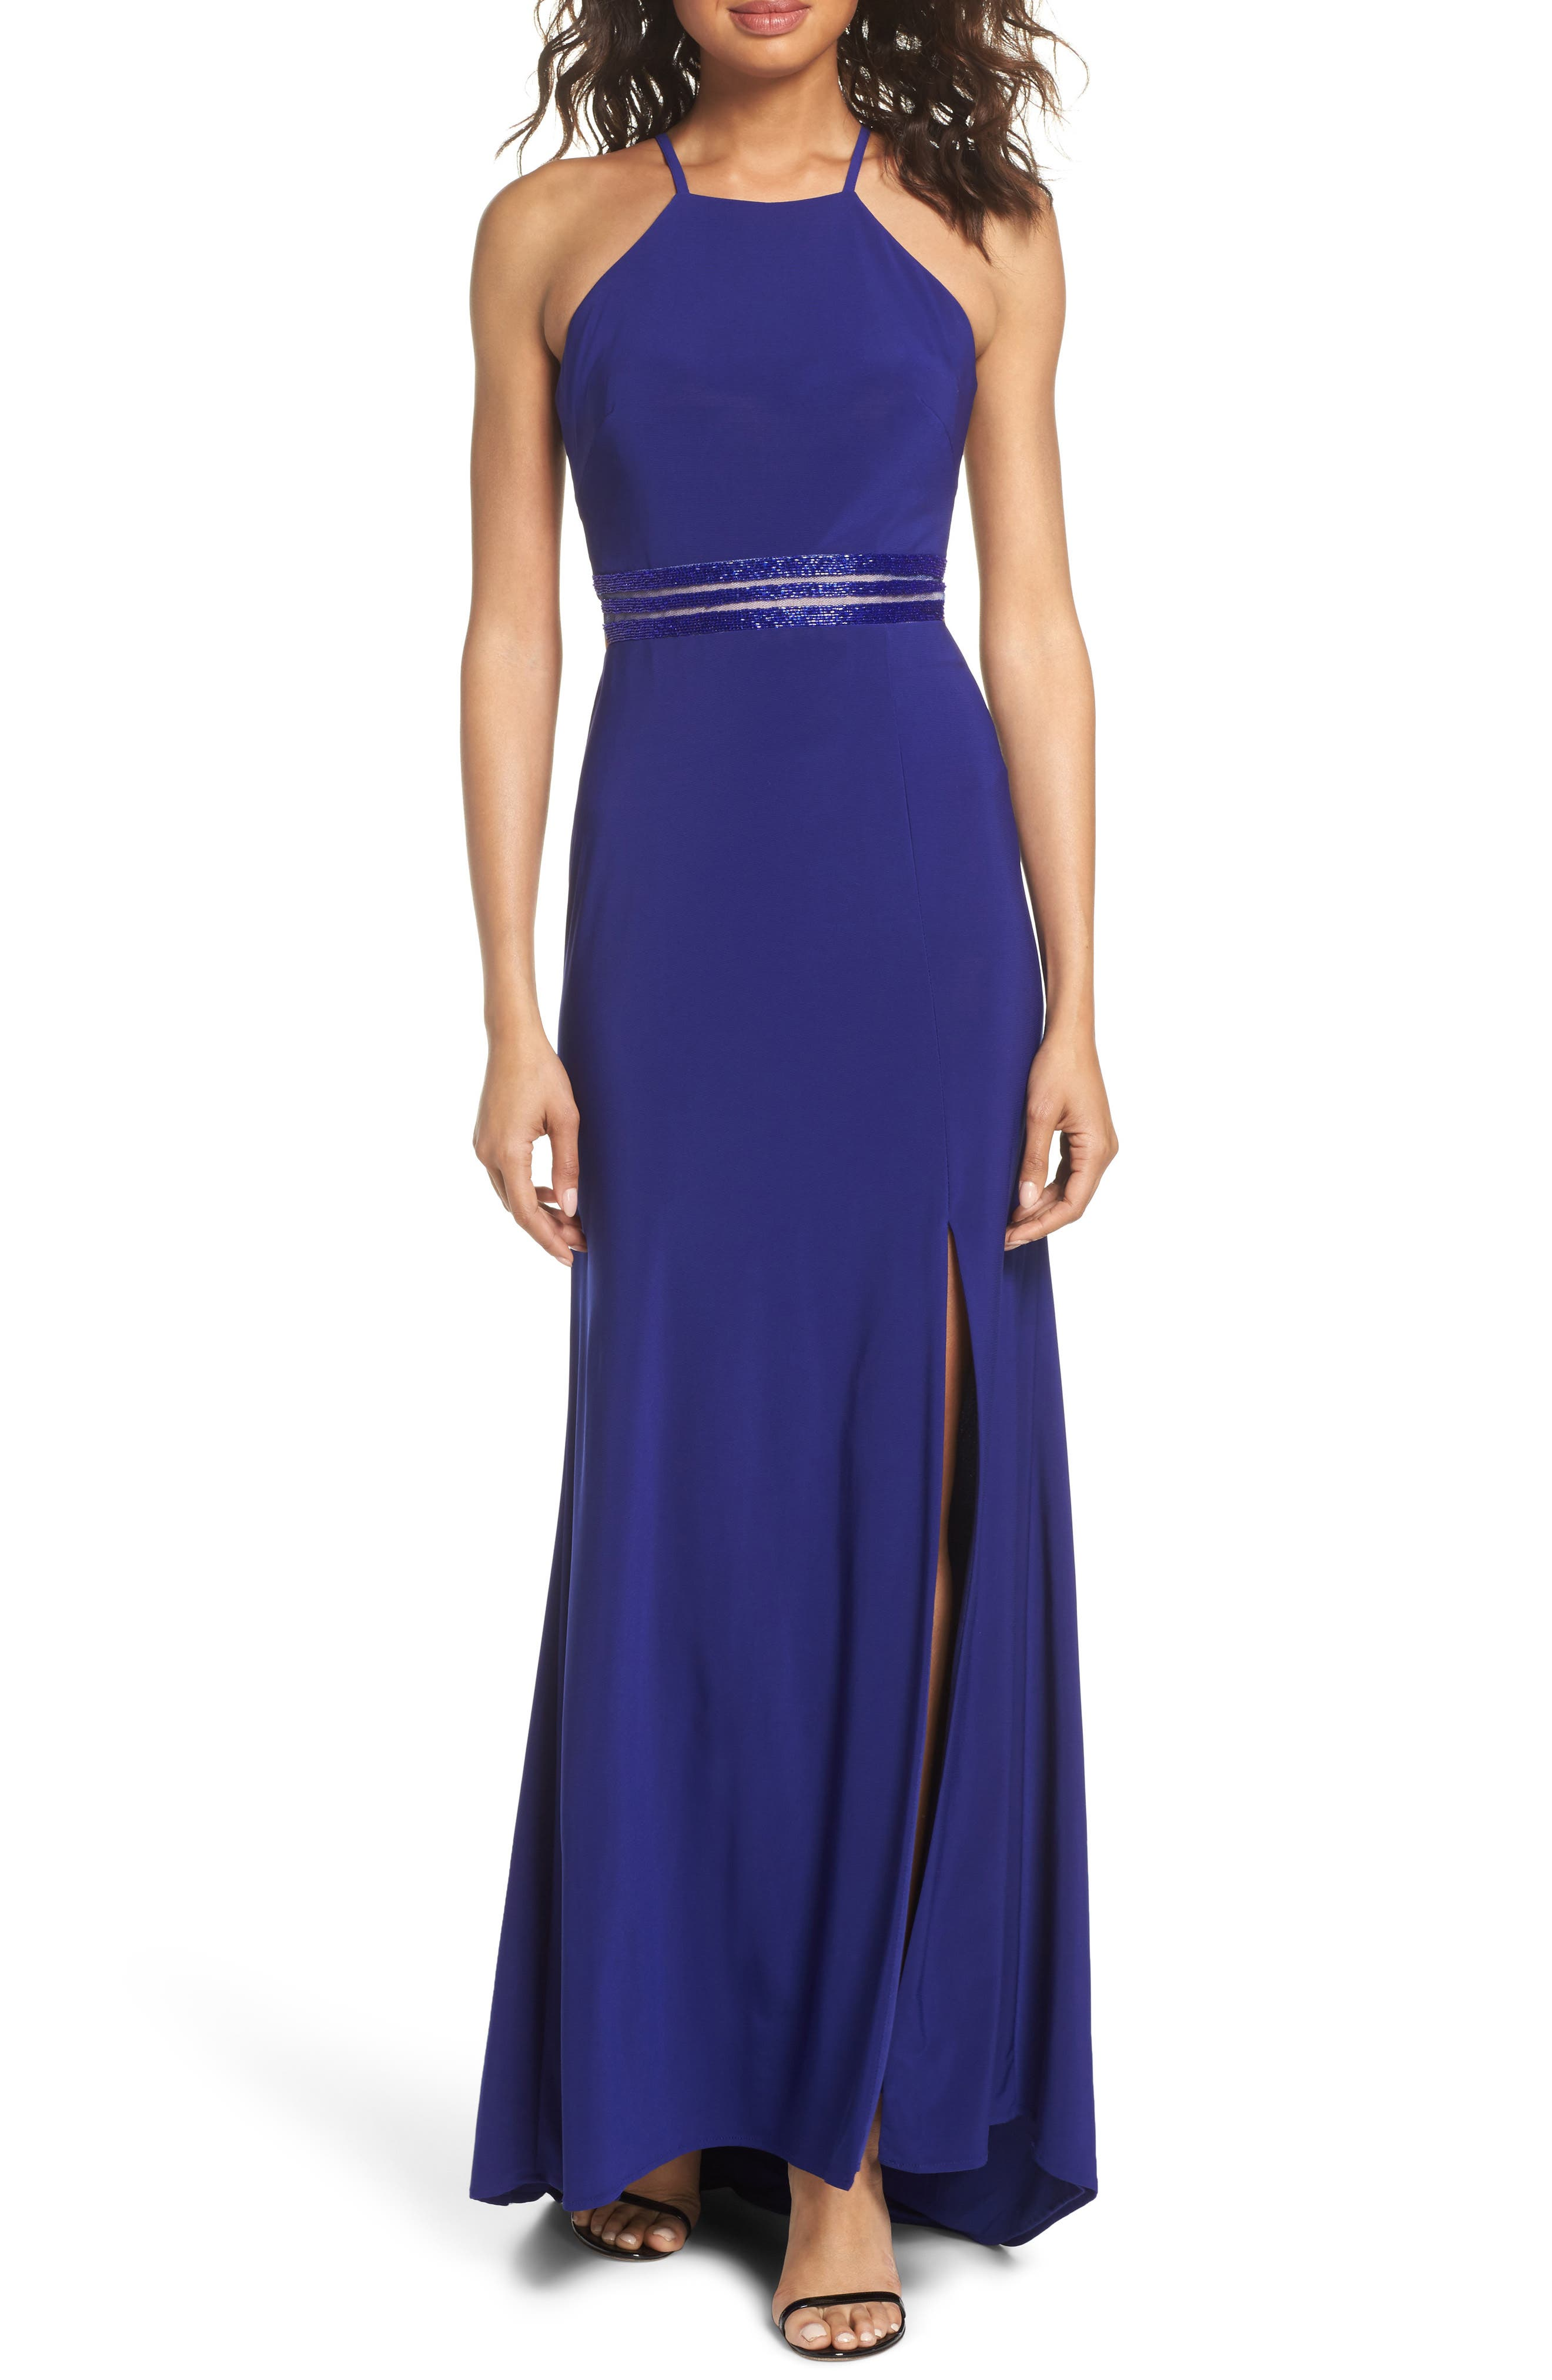 Morgan & Co. Beaded Mesh Halter Gown, /4 - Blue